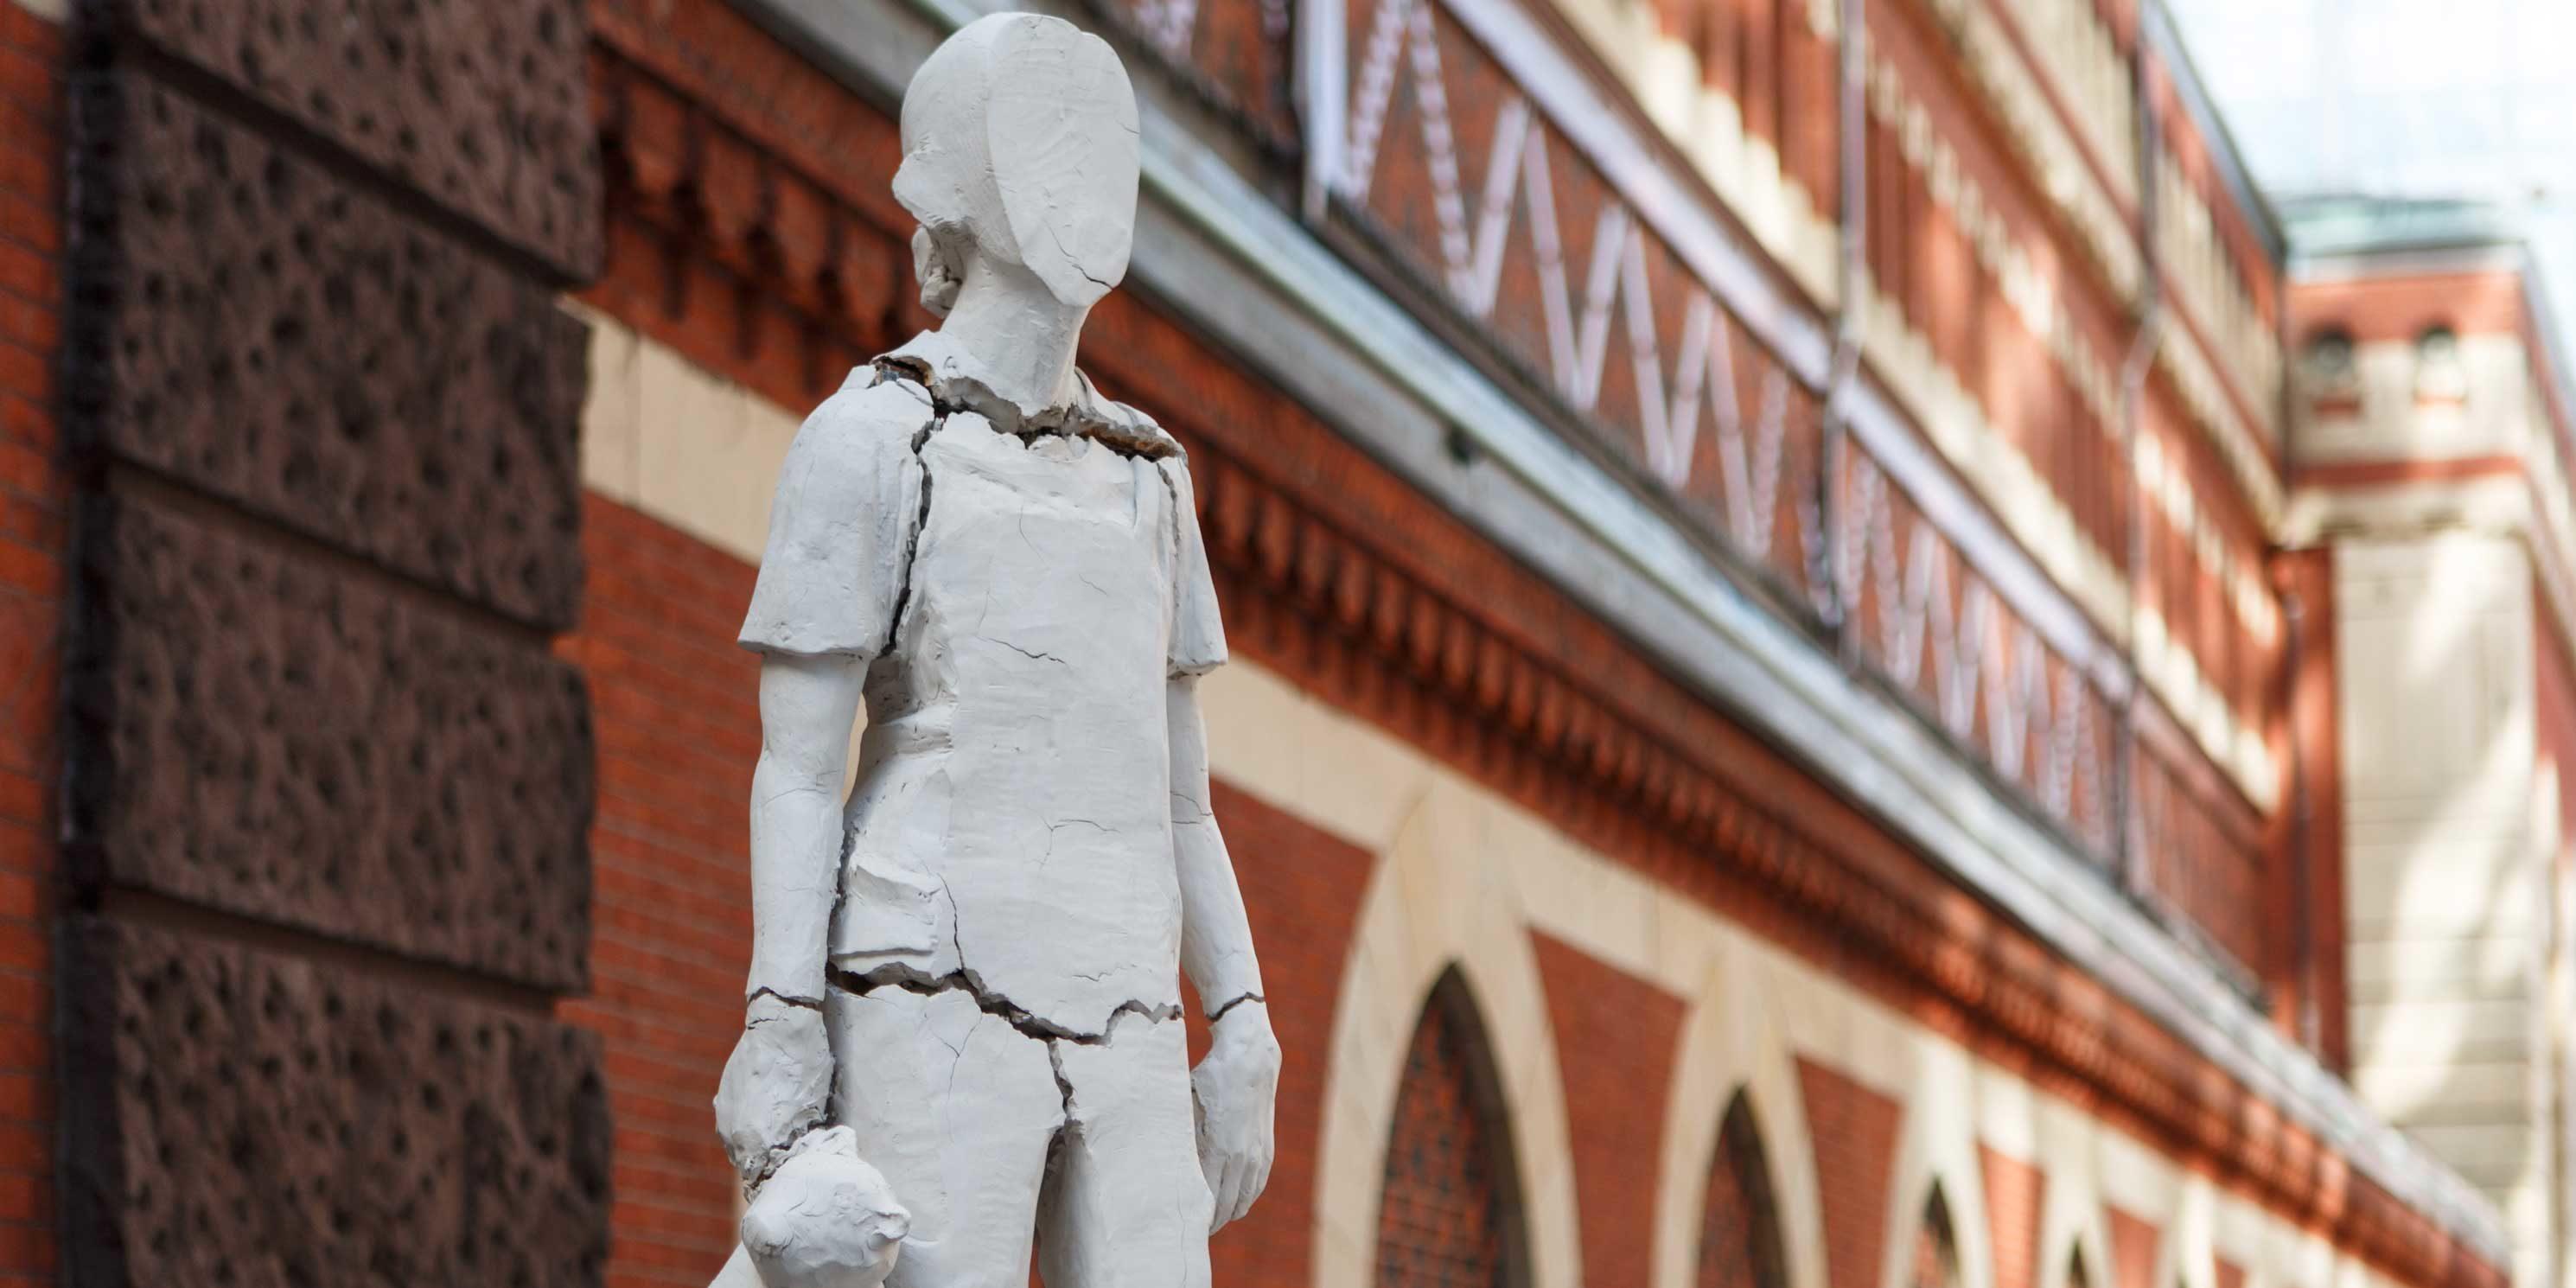 Tania Bruguera, Monument for New Immigrants statue